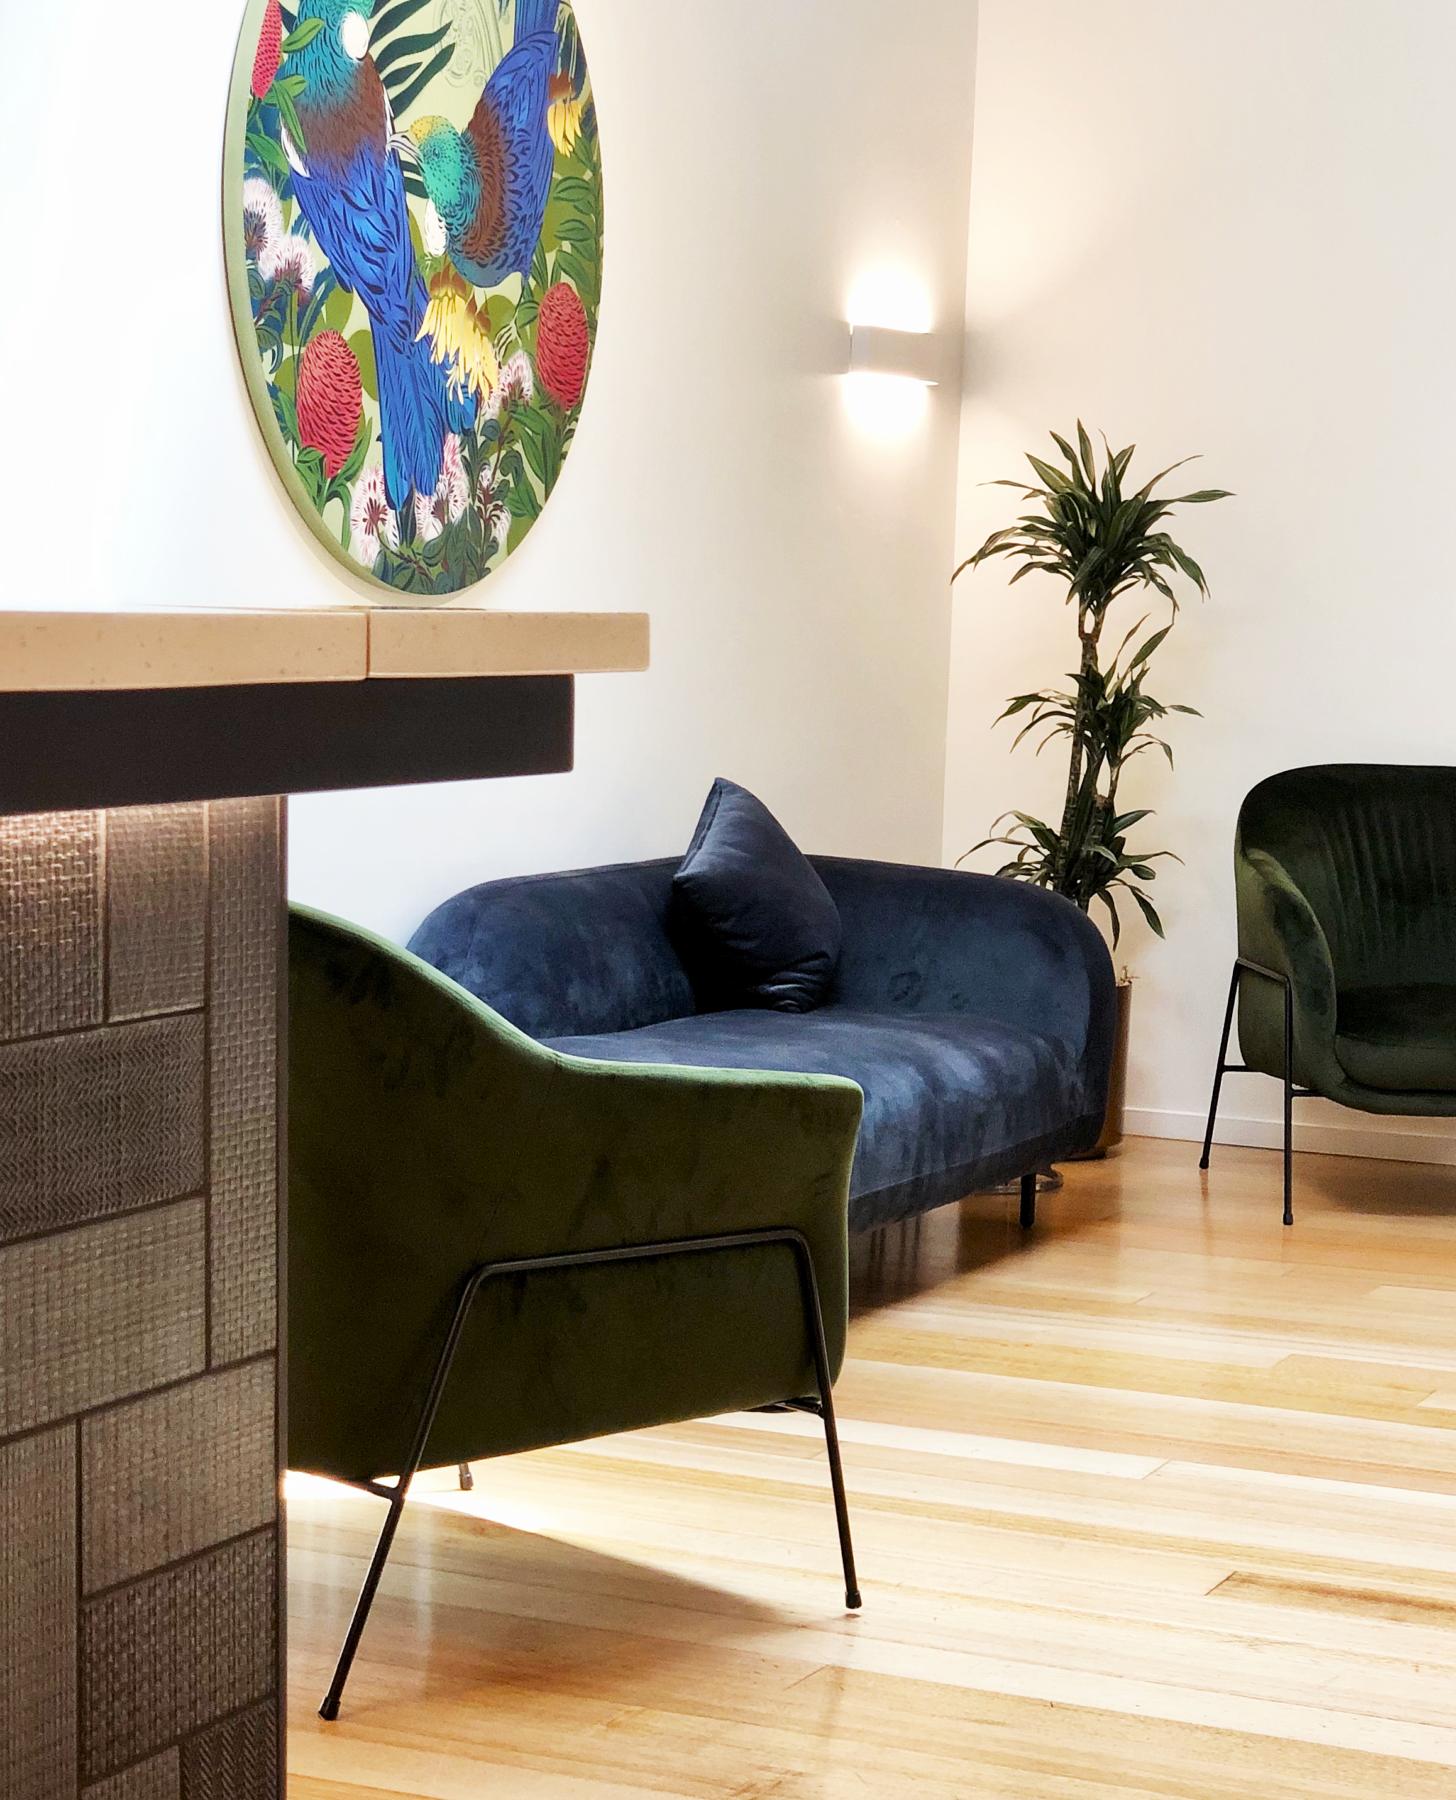 luxury wedding venue with custom flox wall art, velvet chaise and texture black tiles